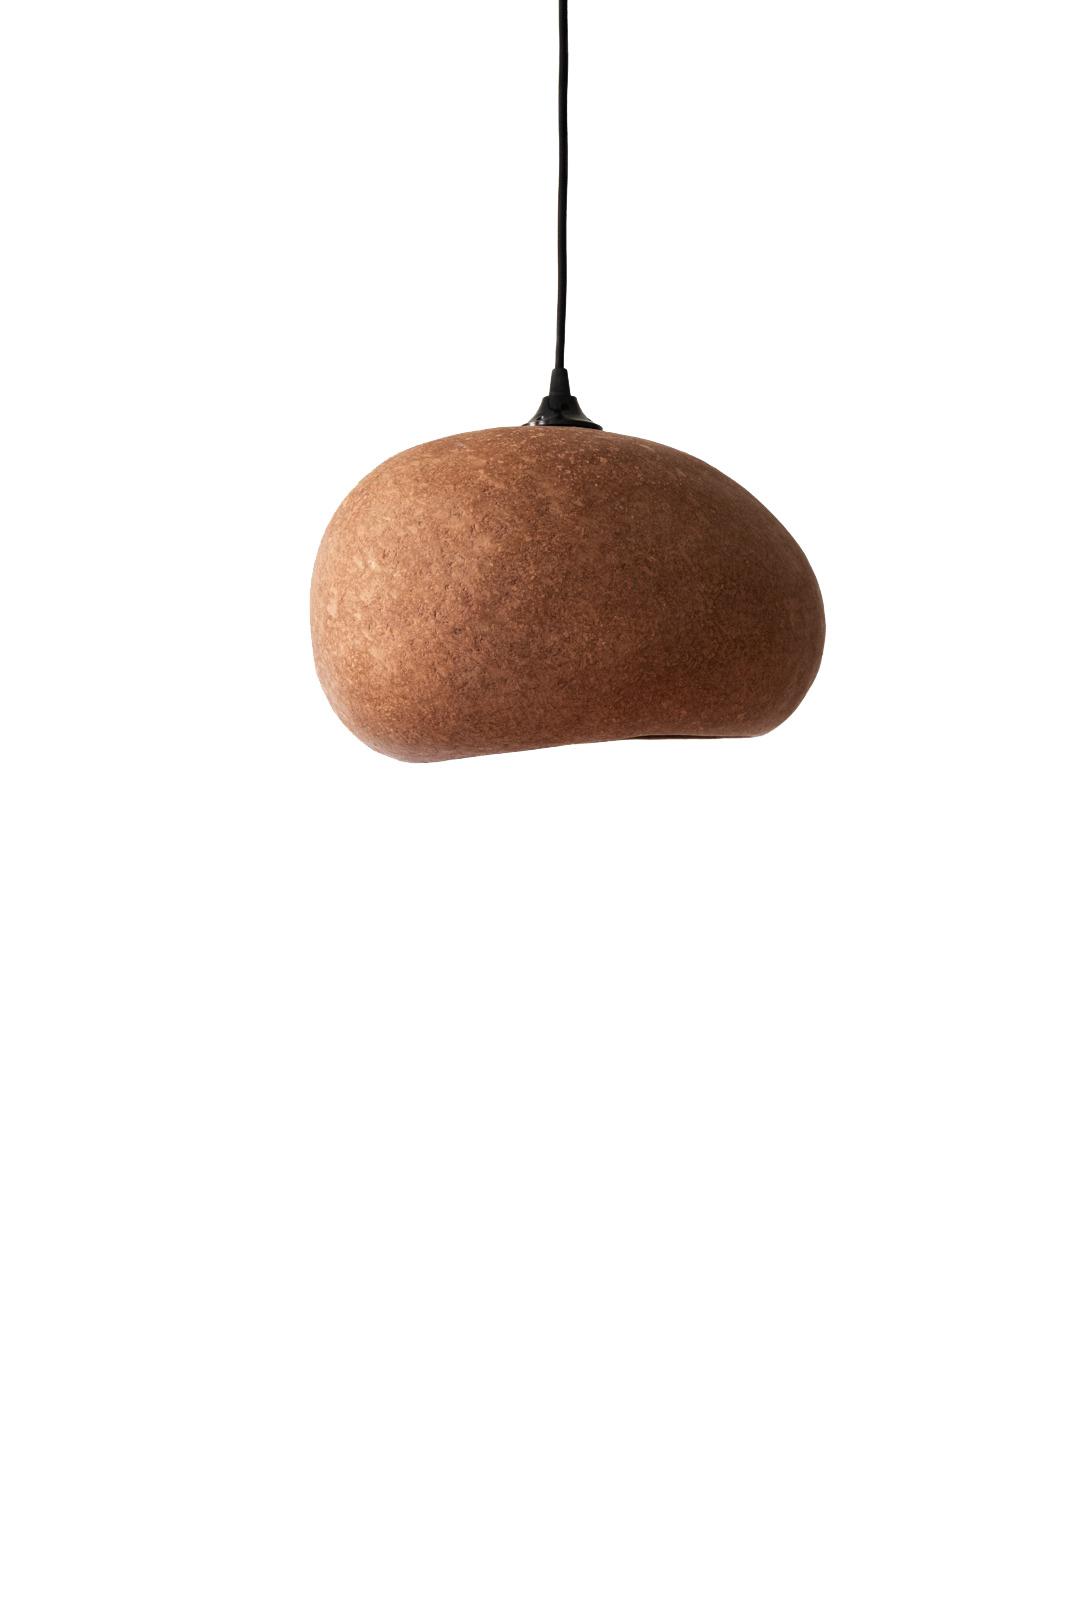 Ay Illuminate Terracotta pendant Lamp M - recycled carton - 36x27x19cm - Ay illuminate